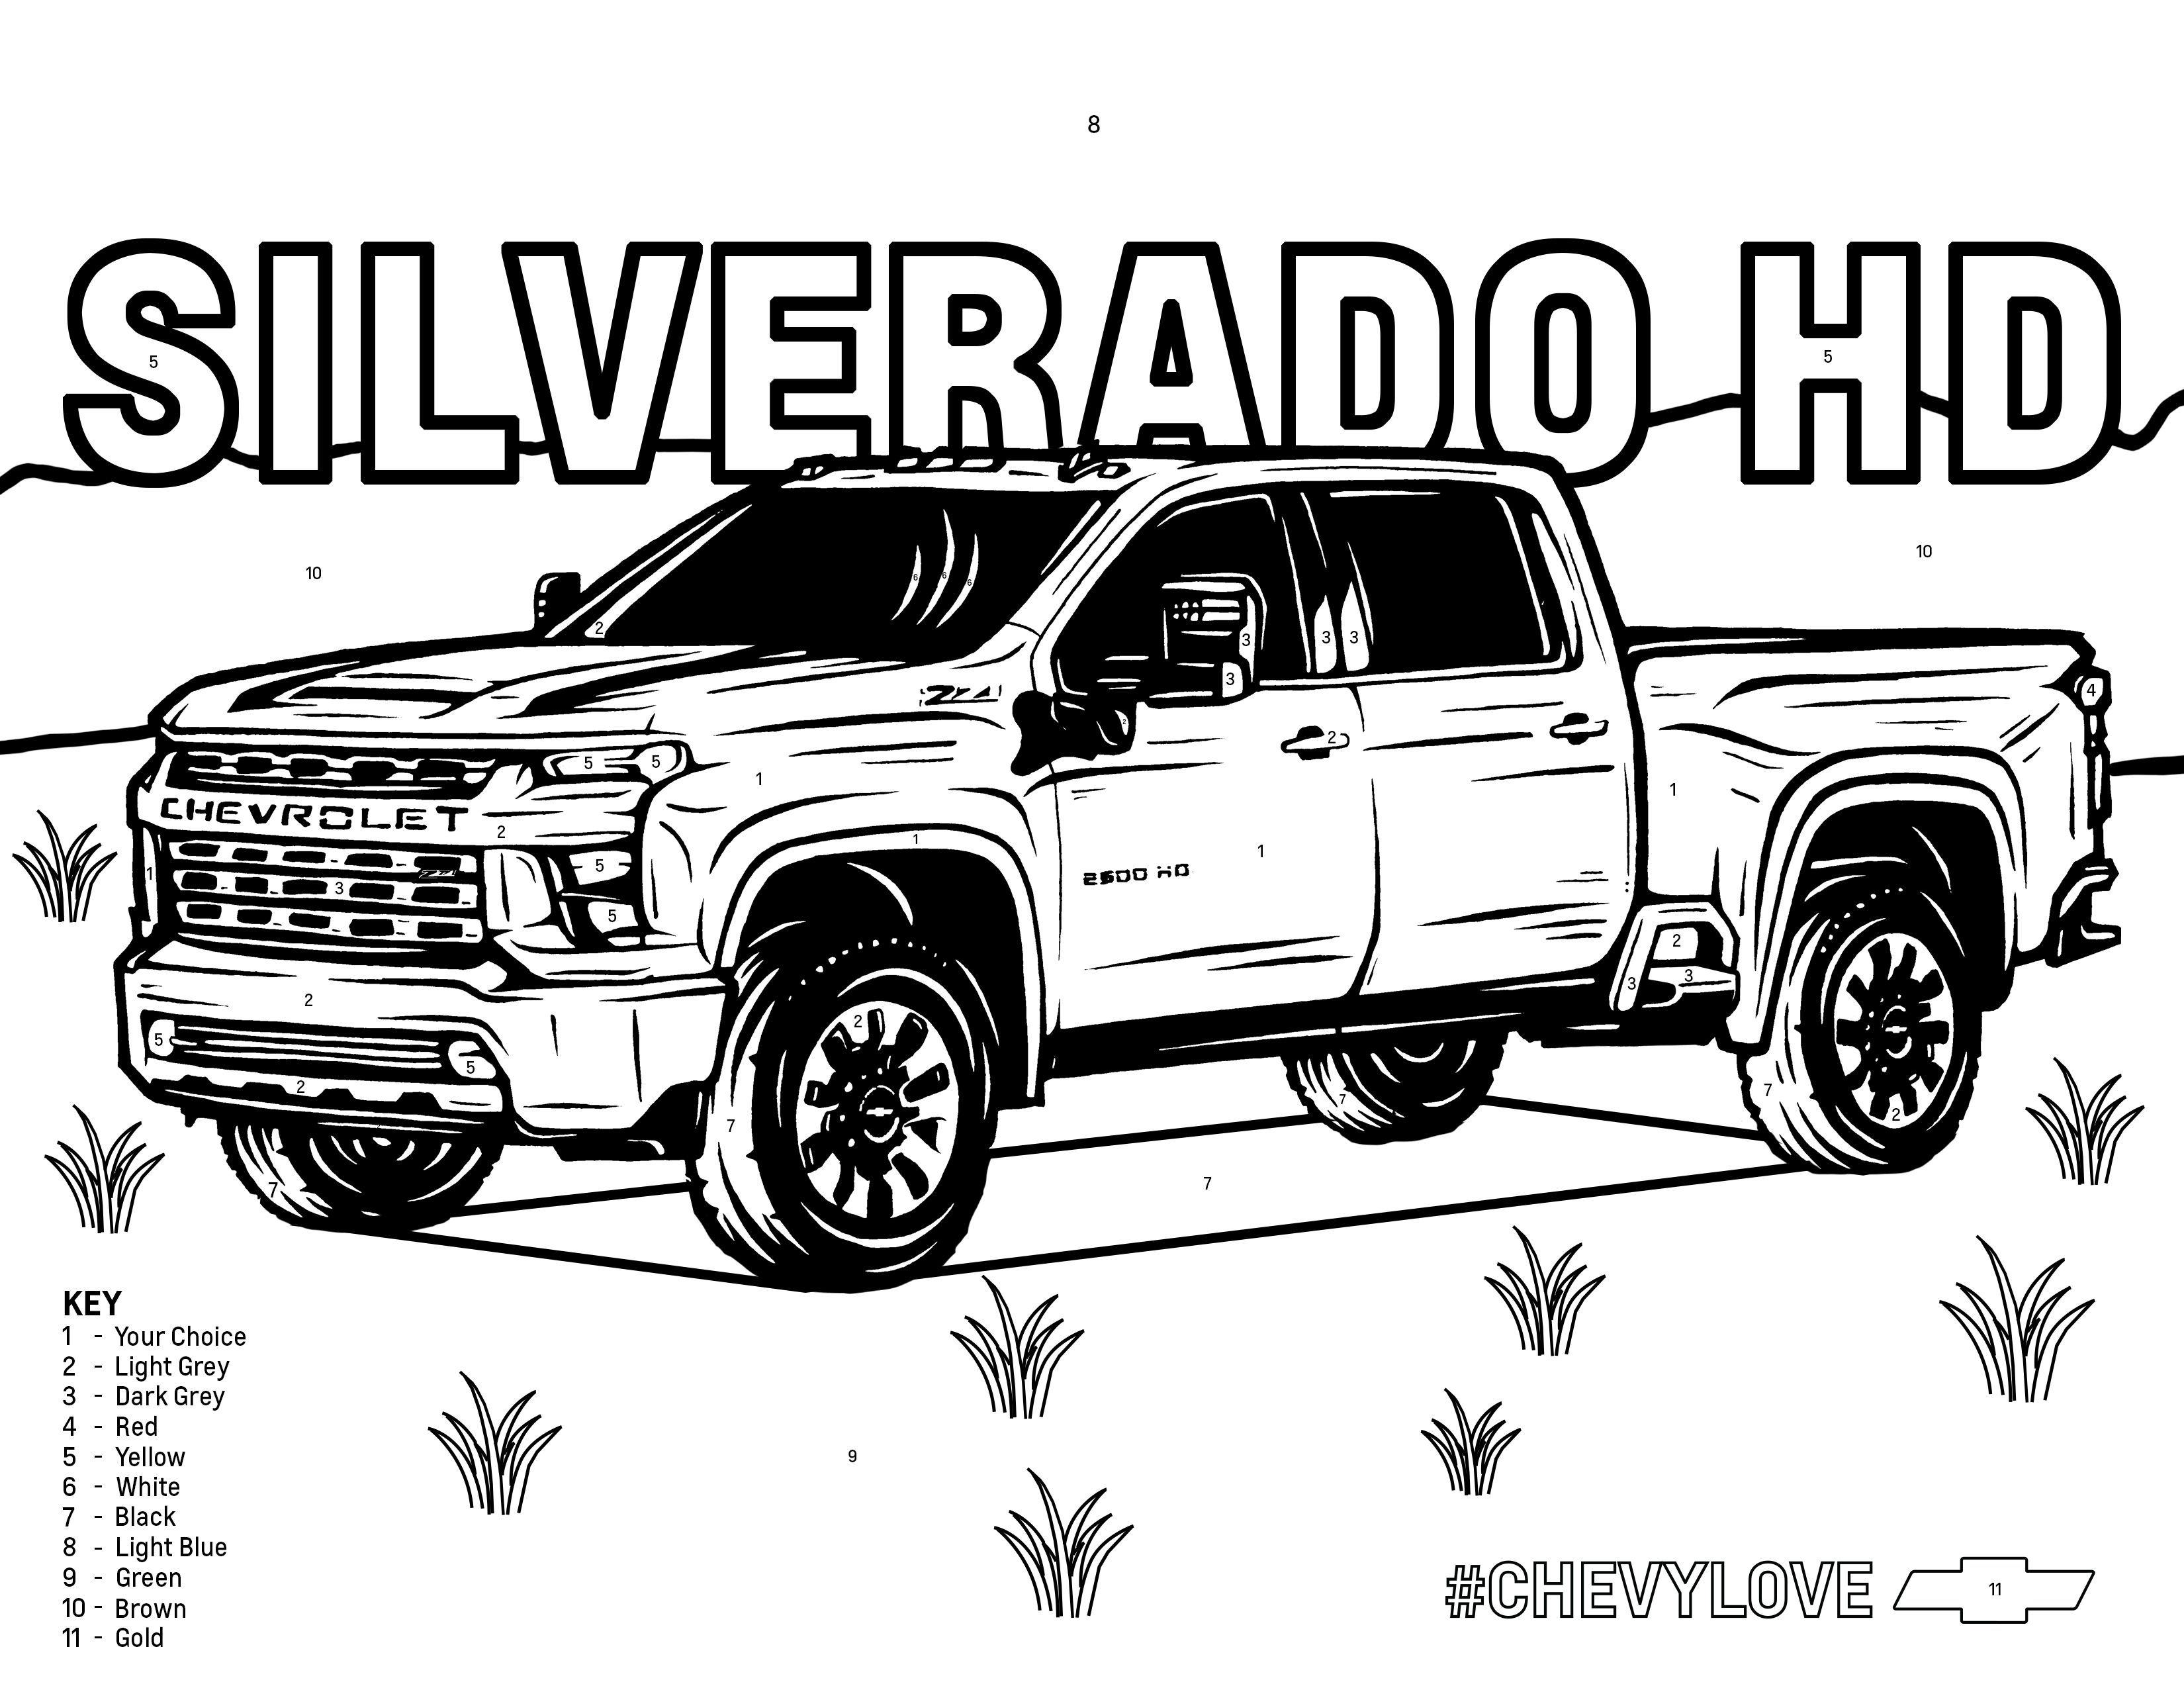 5 Chevy Silverado HD  Chevy silverado hd, Silverado hd, Truck